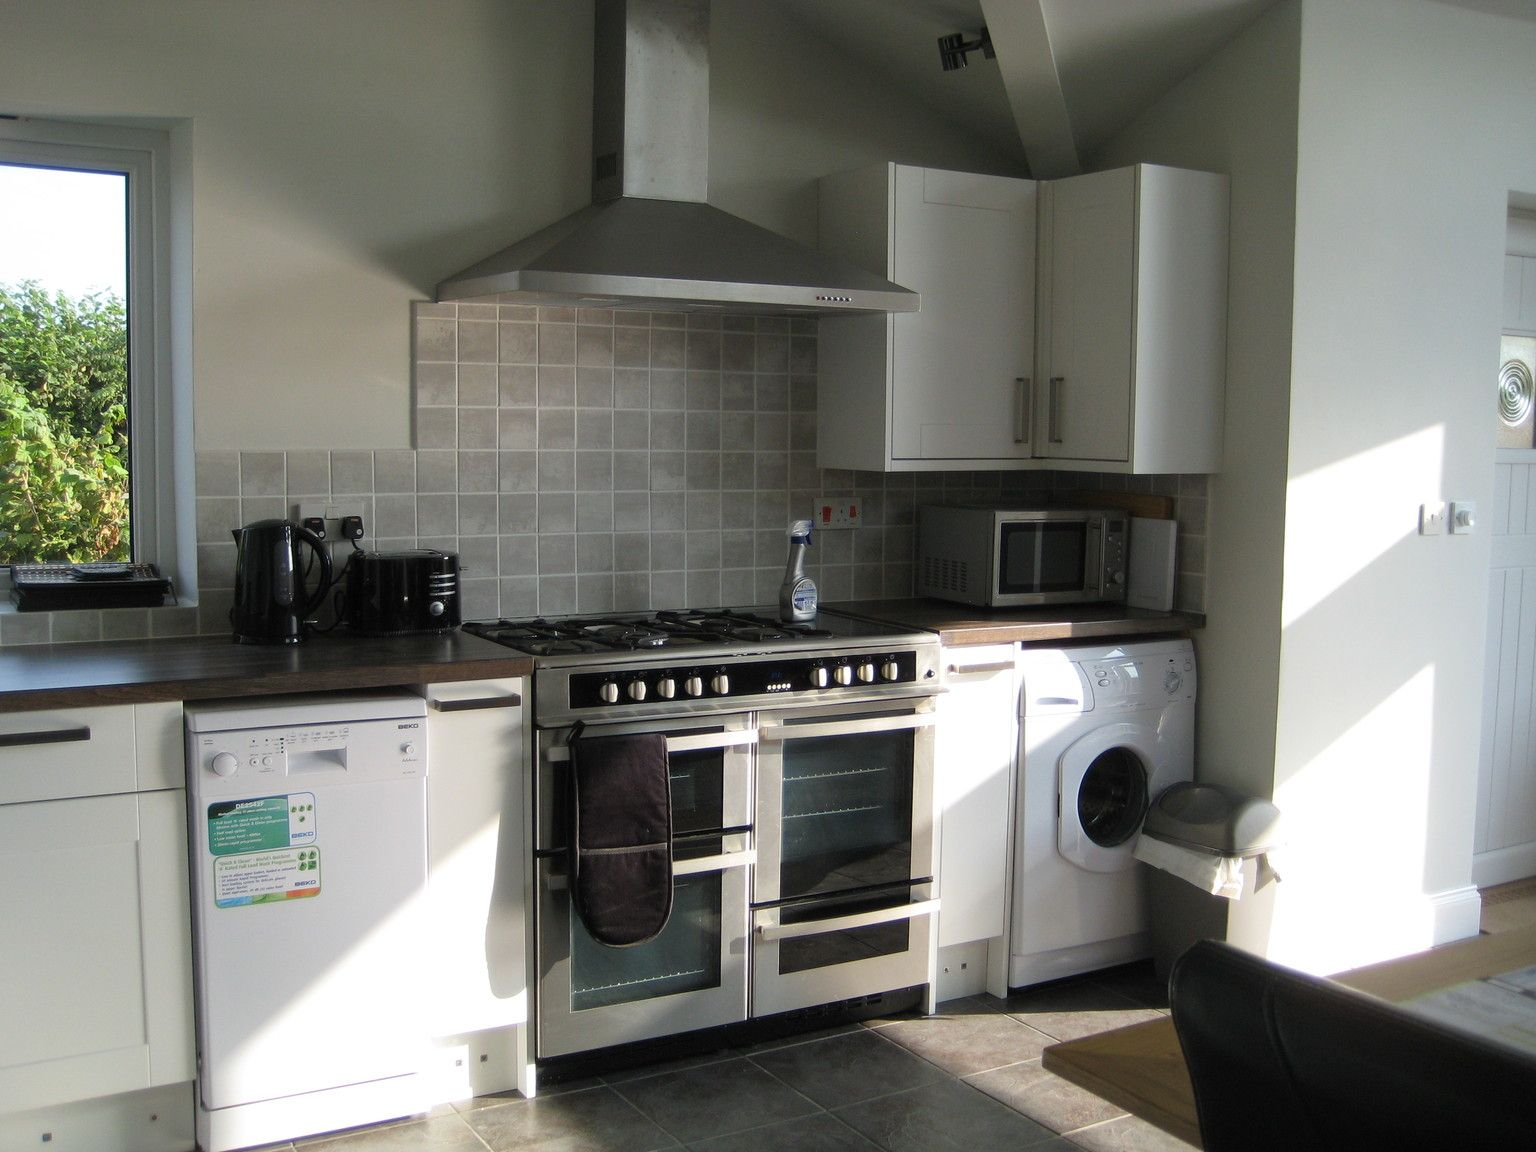 Garage Kitchen Conversion wall mounted range hood backsplash edge | completed garage